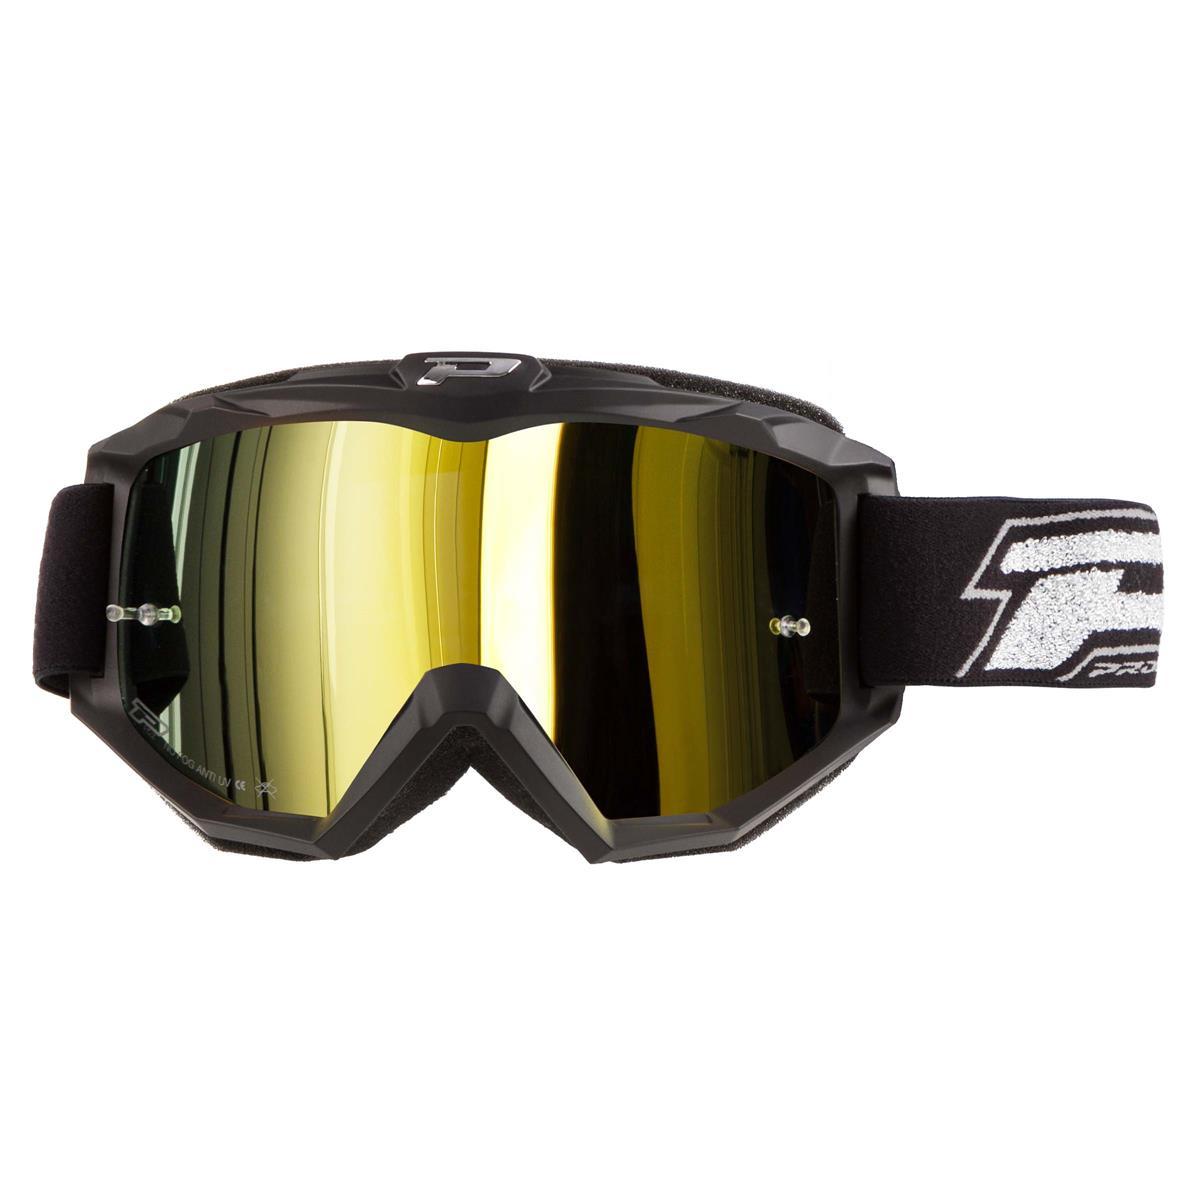 ProGrip Crossbrille 3204 FL Shiny Gelb Mirrored